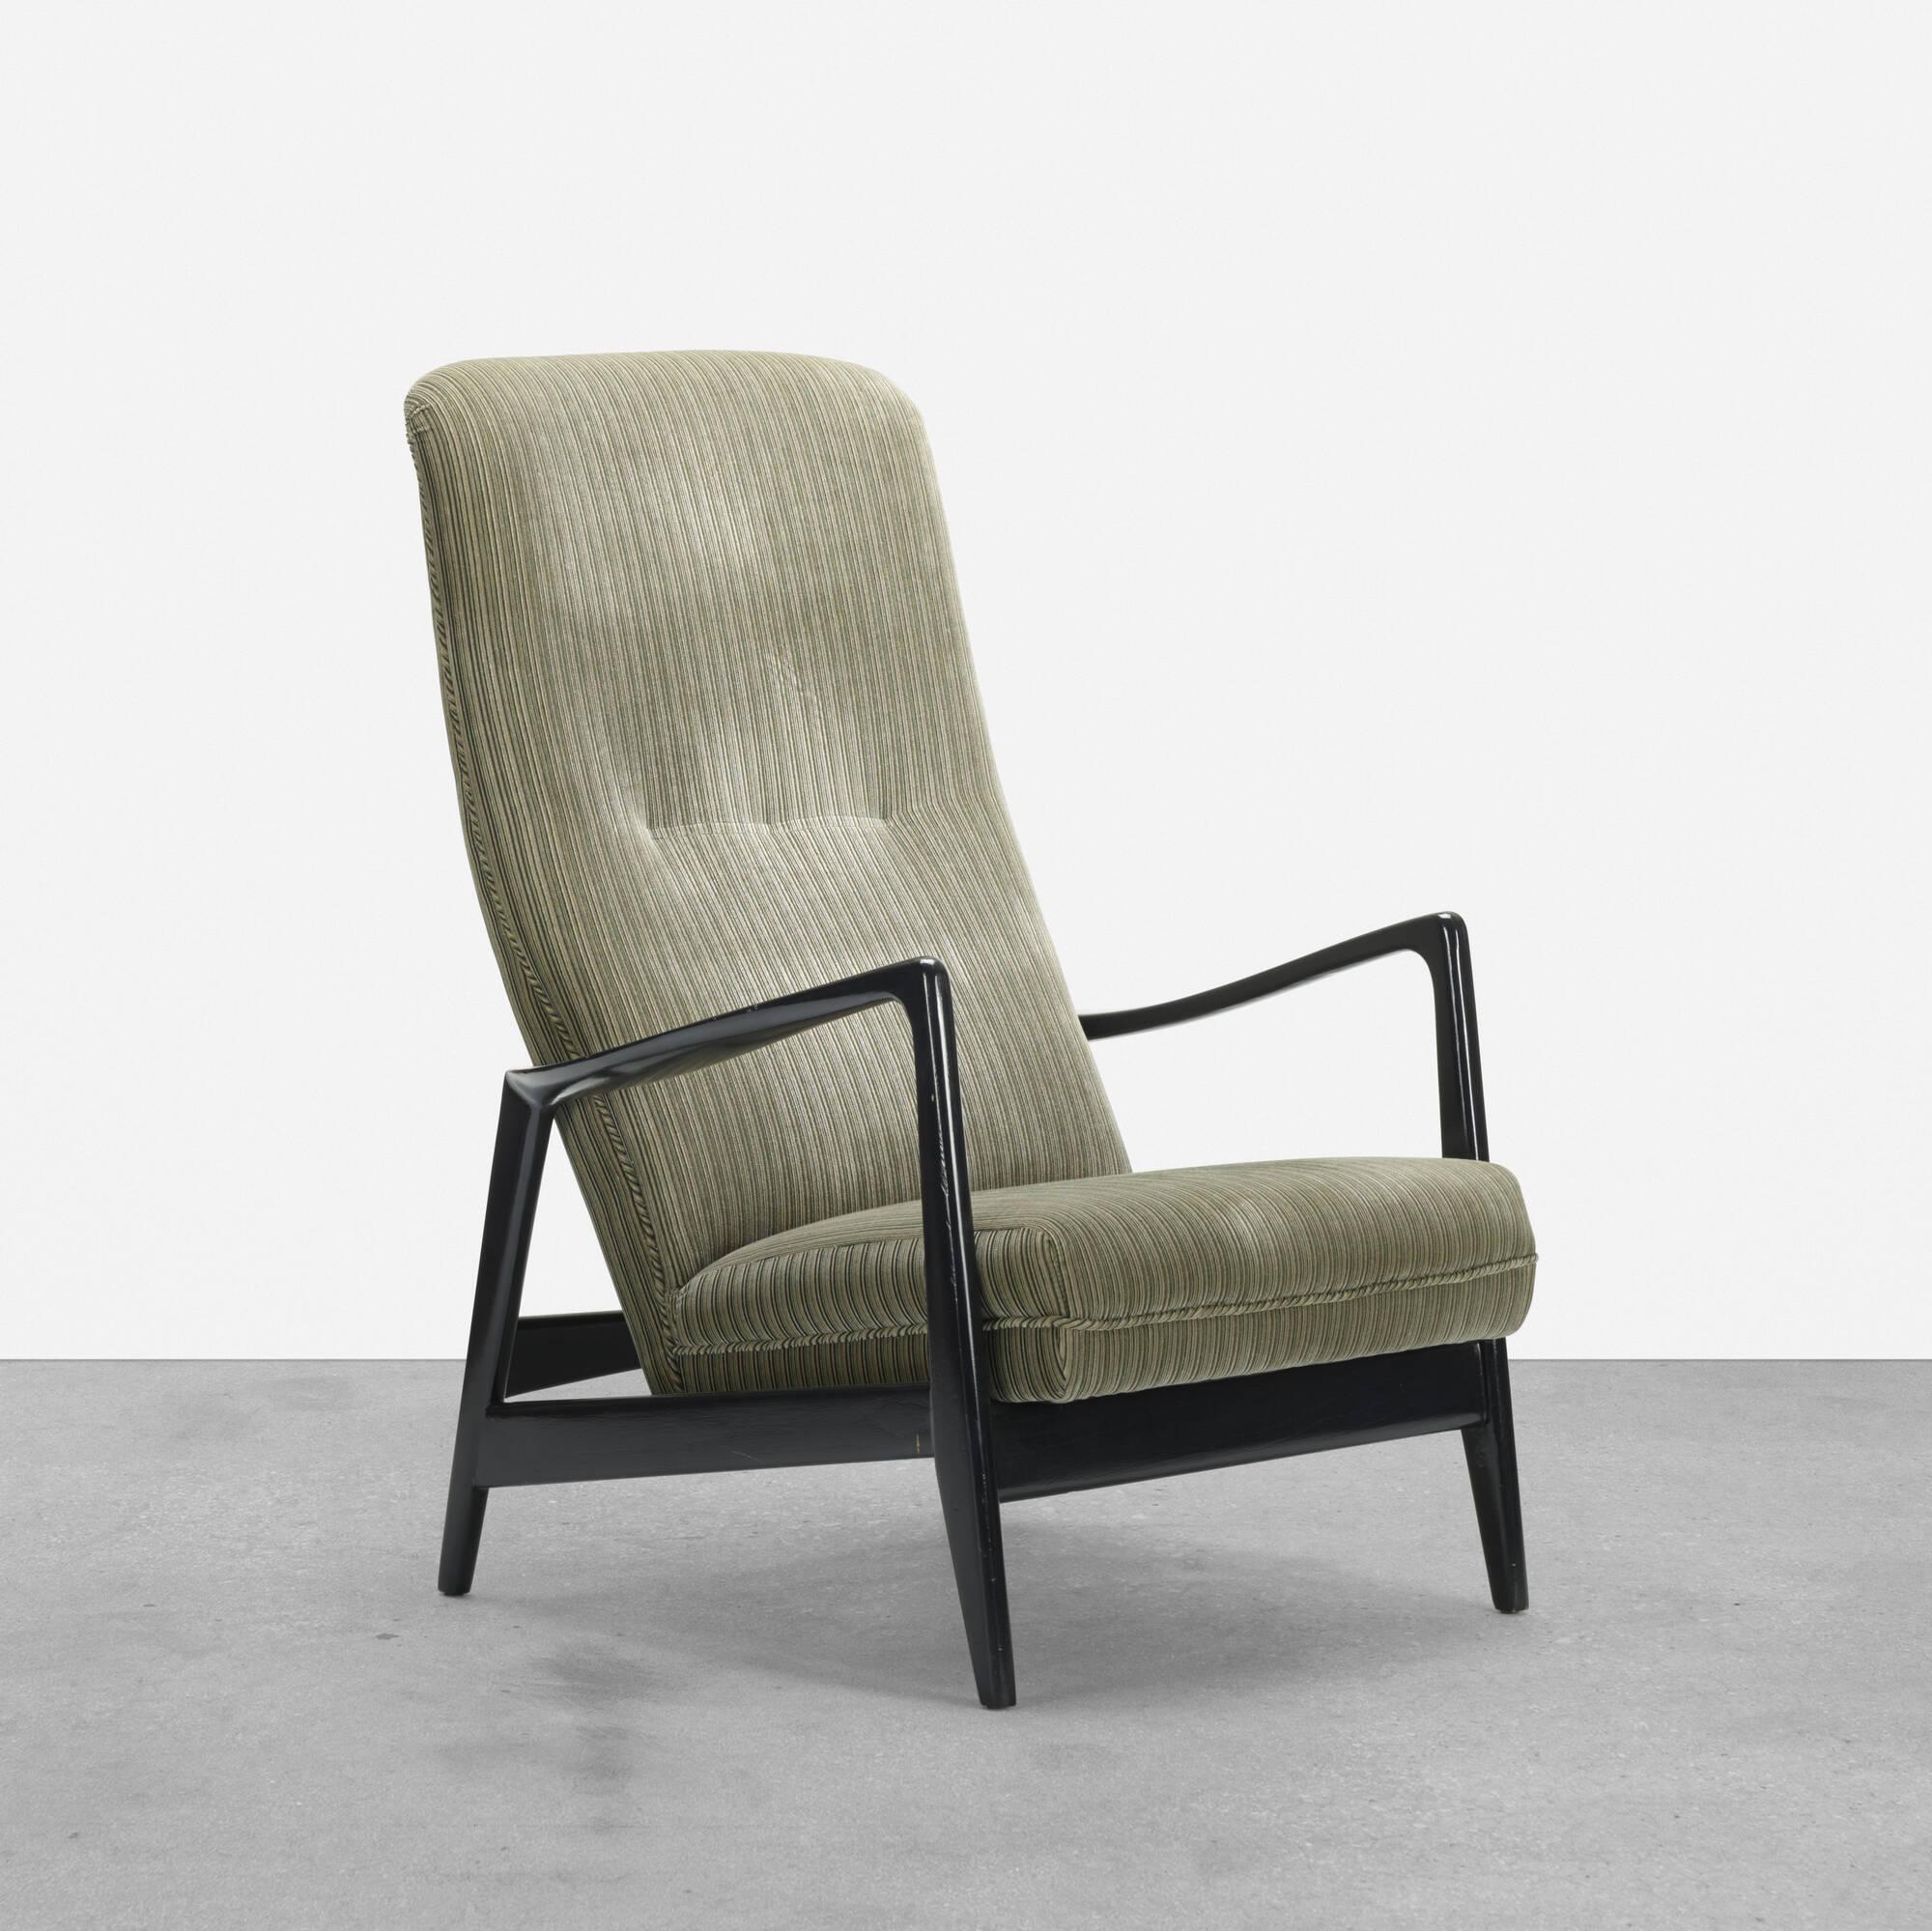 248: Gio Ponti / armchair, model 829 (1 of 3)